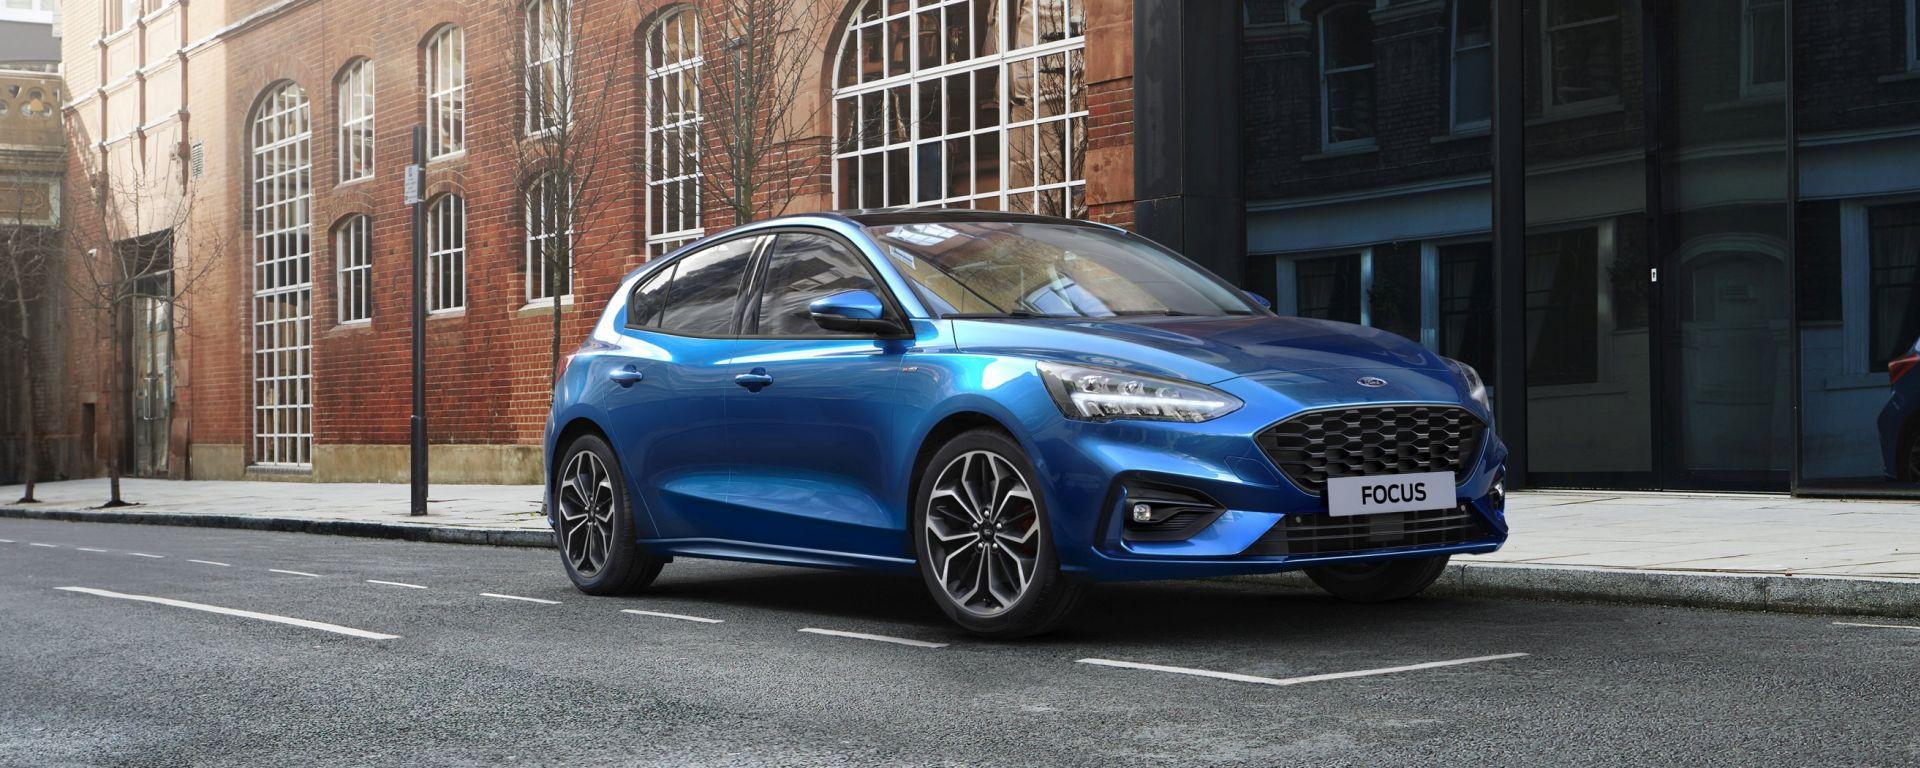 Ford Focus EcoBoost Hybrid: presentata la media ibrida